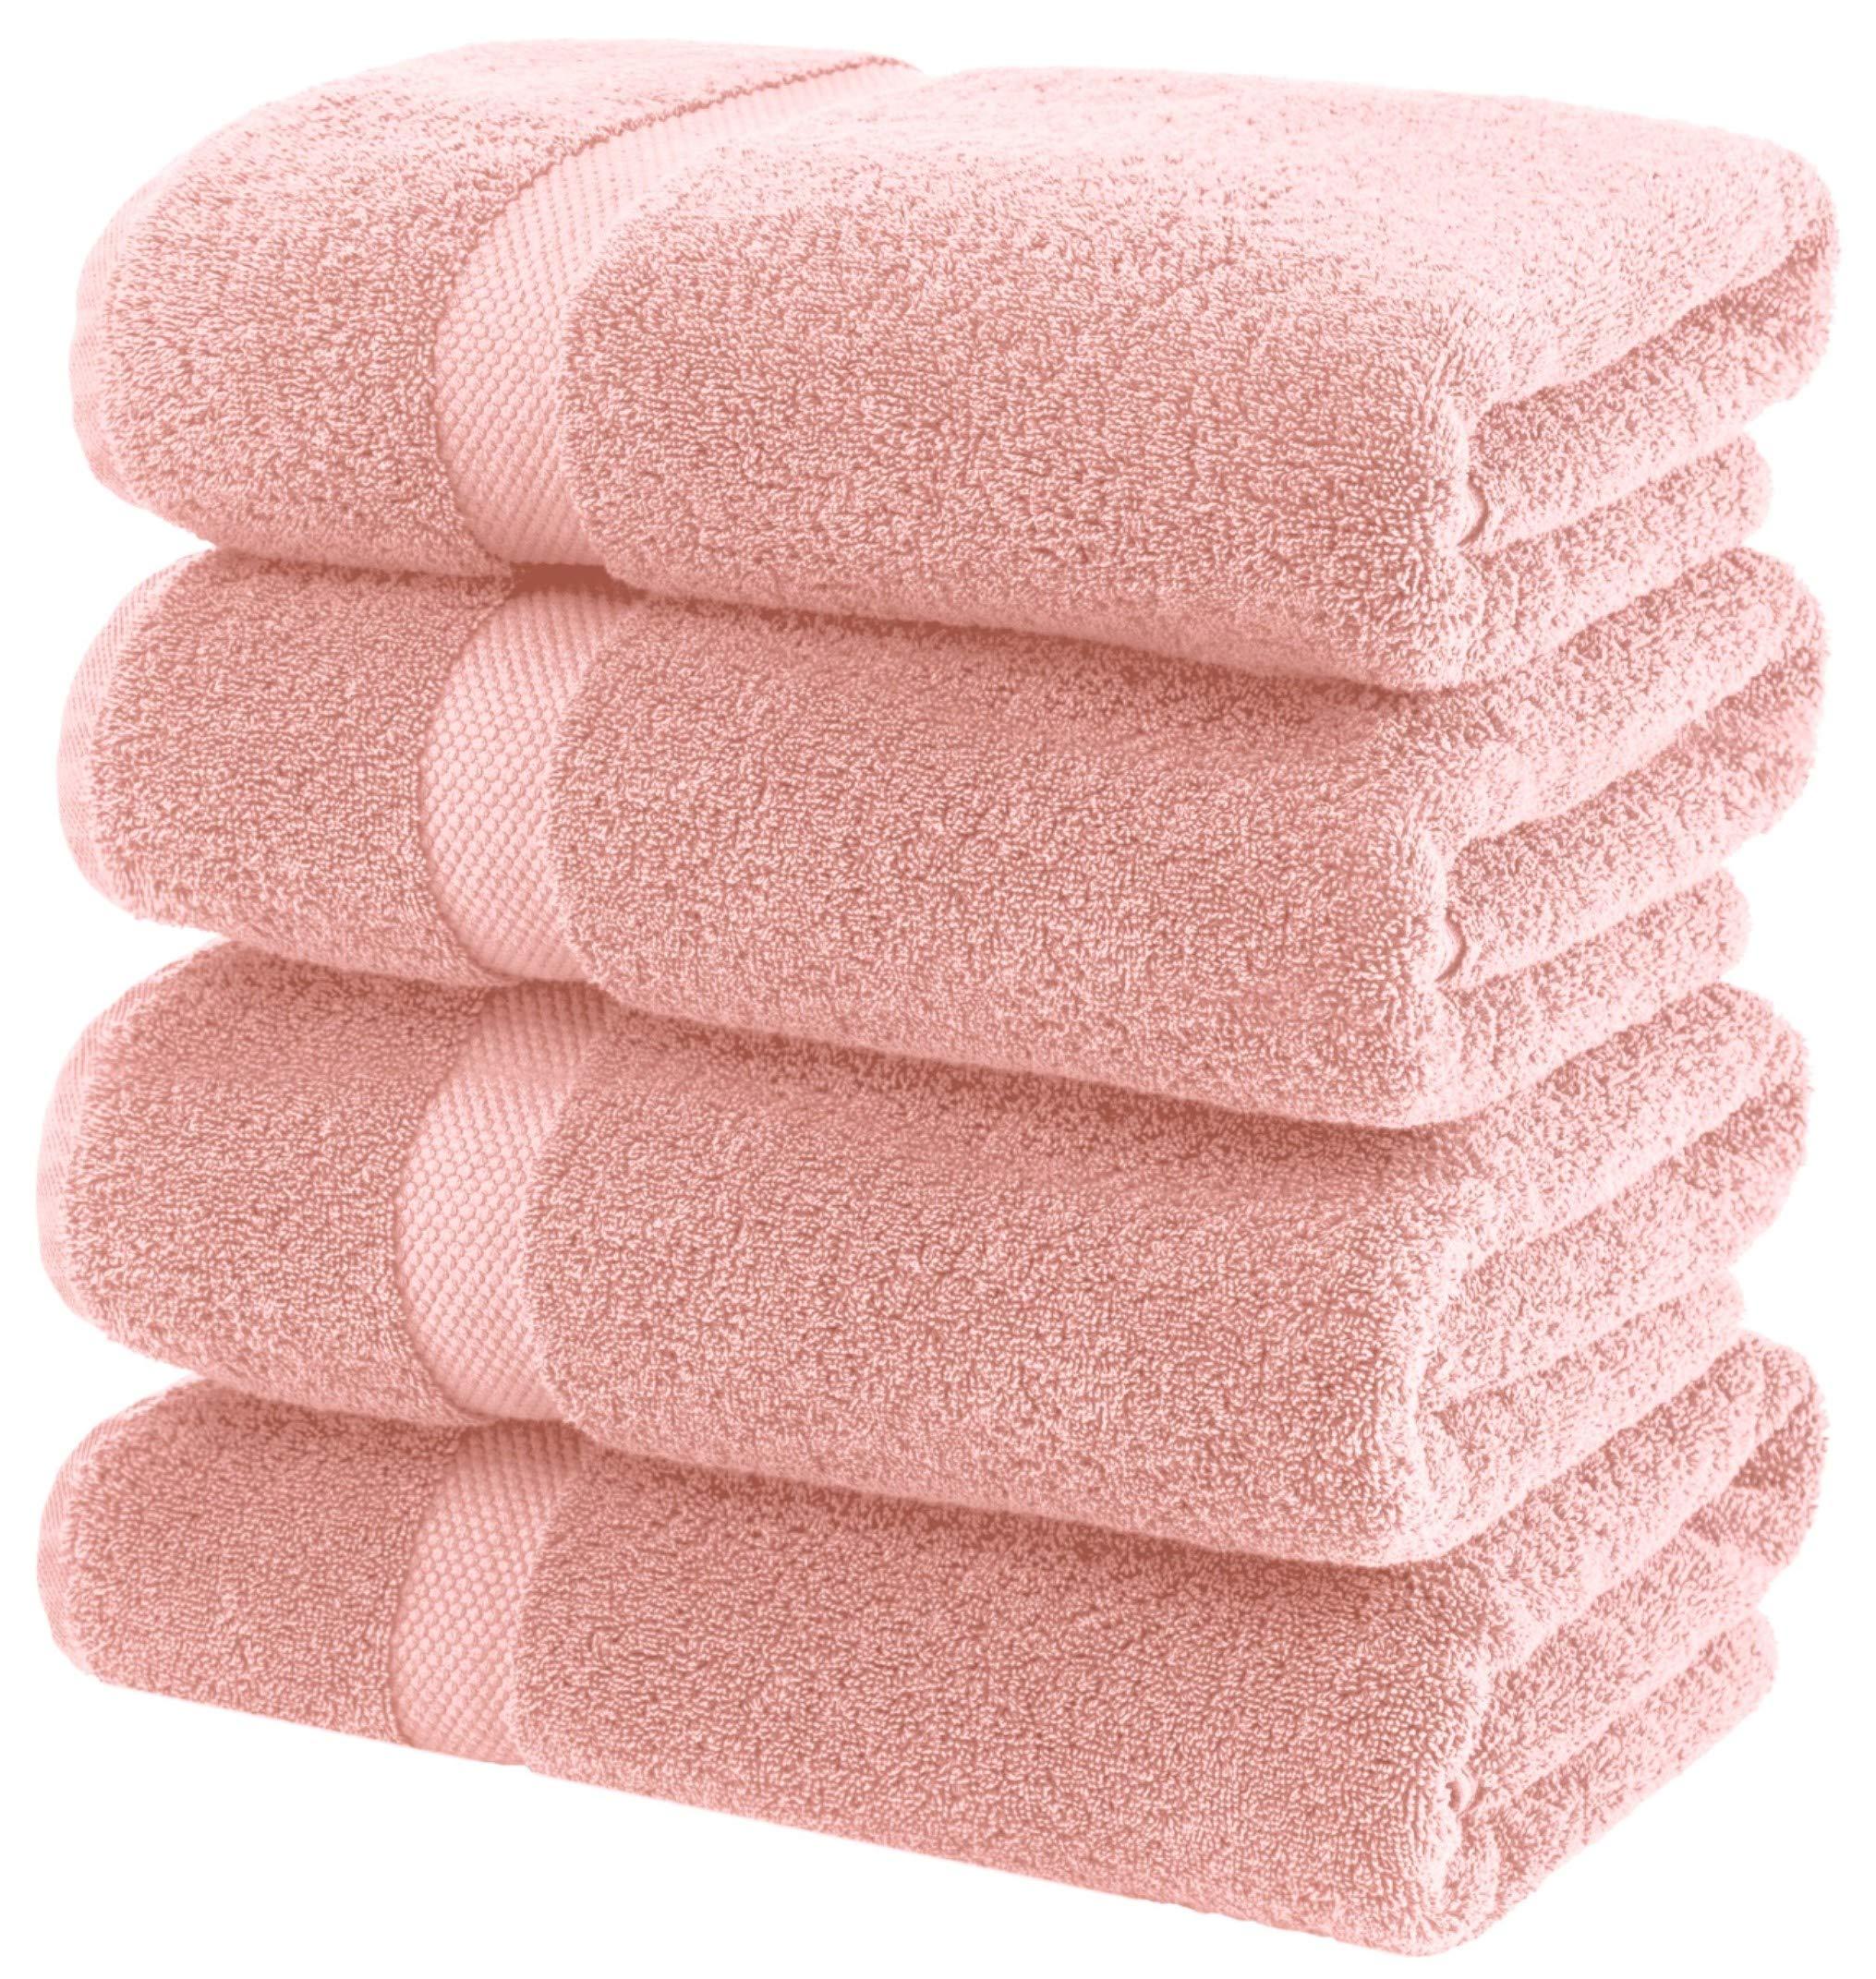 WKLNM Asciugamano da Bagno Luxury Bath Towels Wash Cloths for Home Spa Vintage Germany Flag Towels Soft Absorbent Shower /& Bath Towel Extra Large Bath Sheets Beach Sauna Hotel